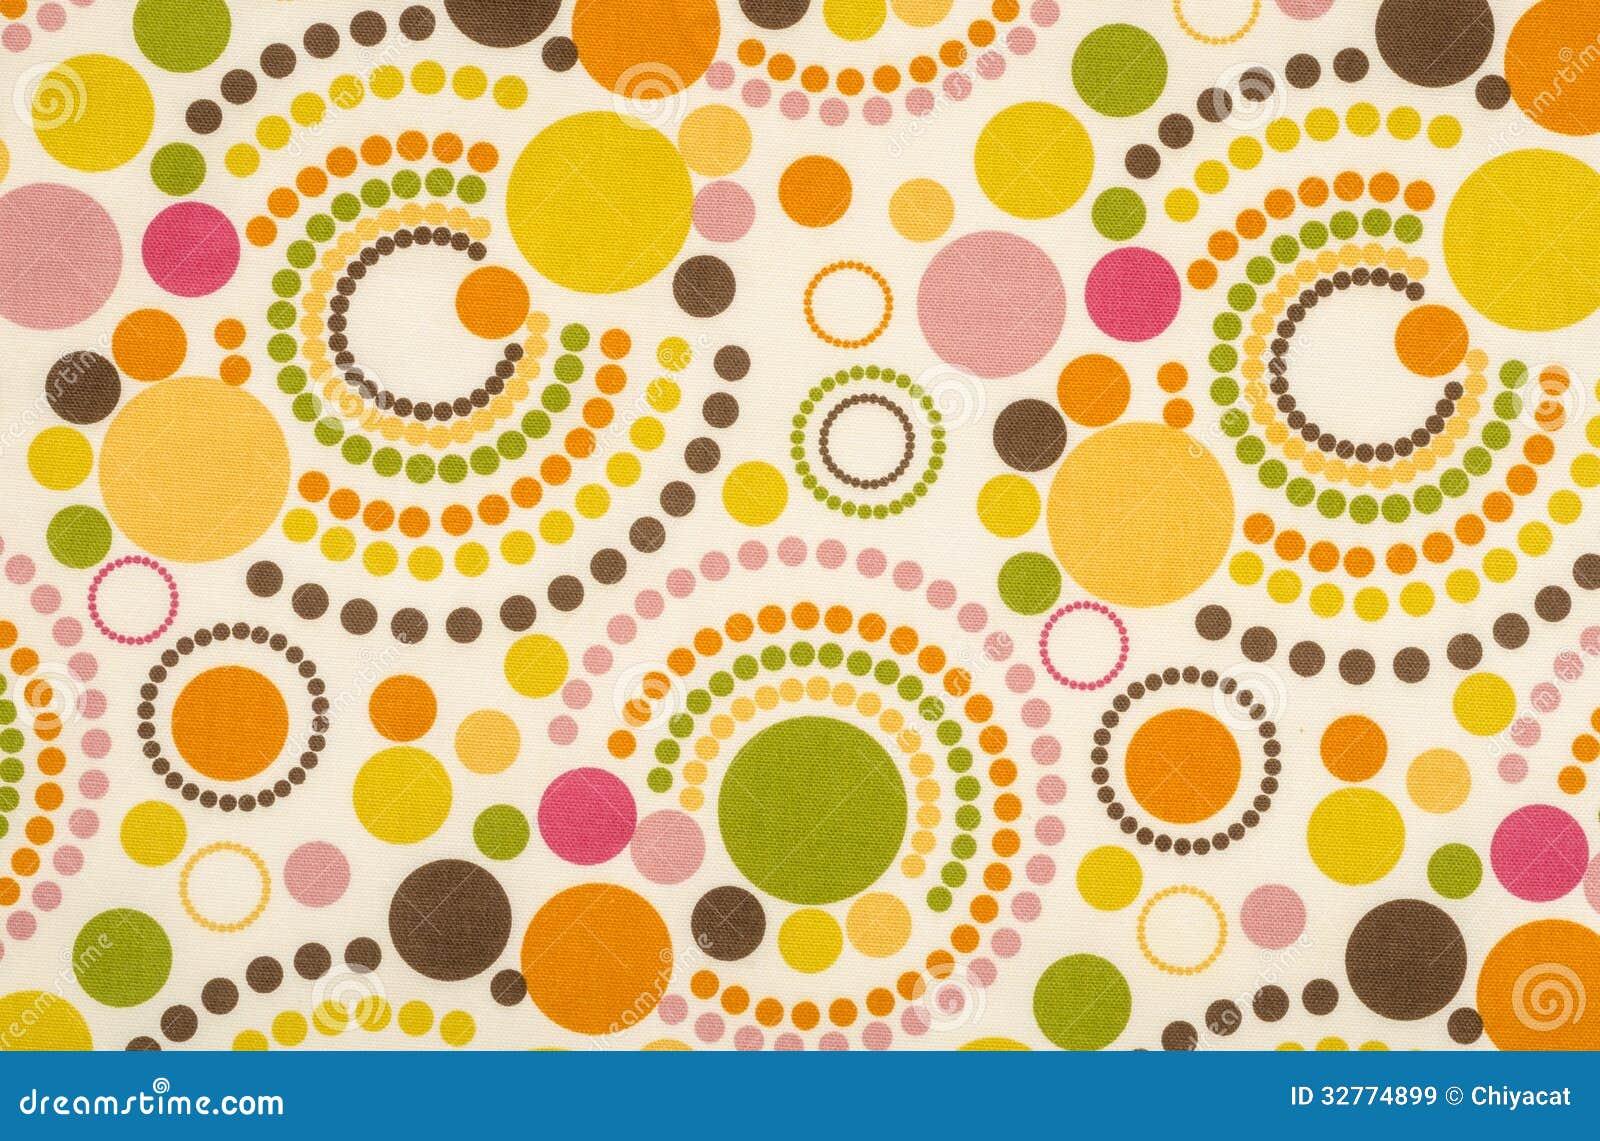 Colorful Polka Dot Fabric Royalty Free Stock Images - Image: 32774899